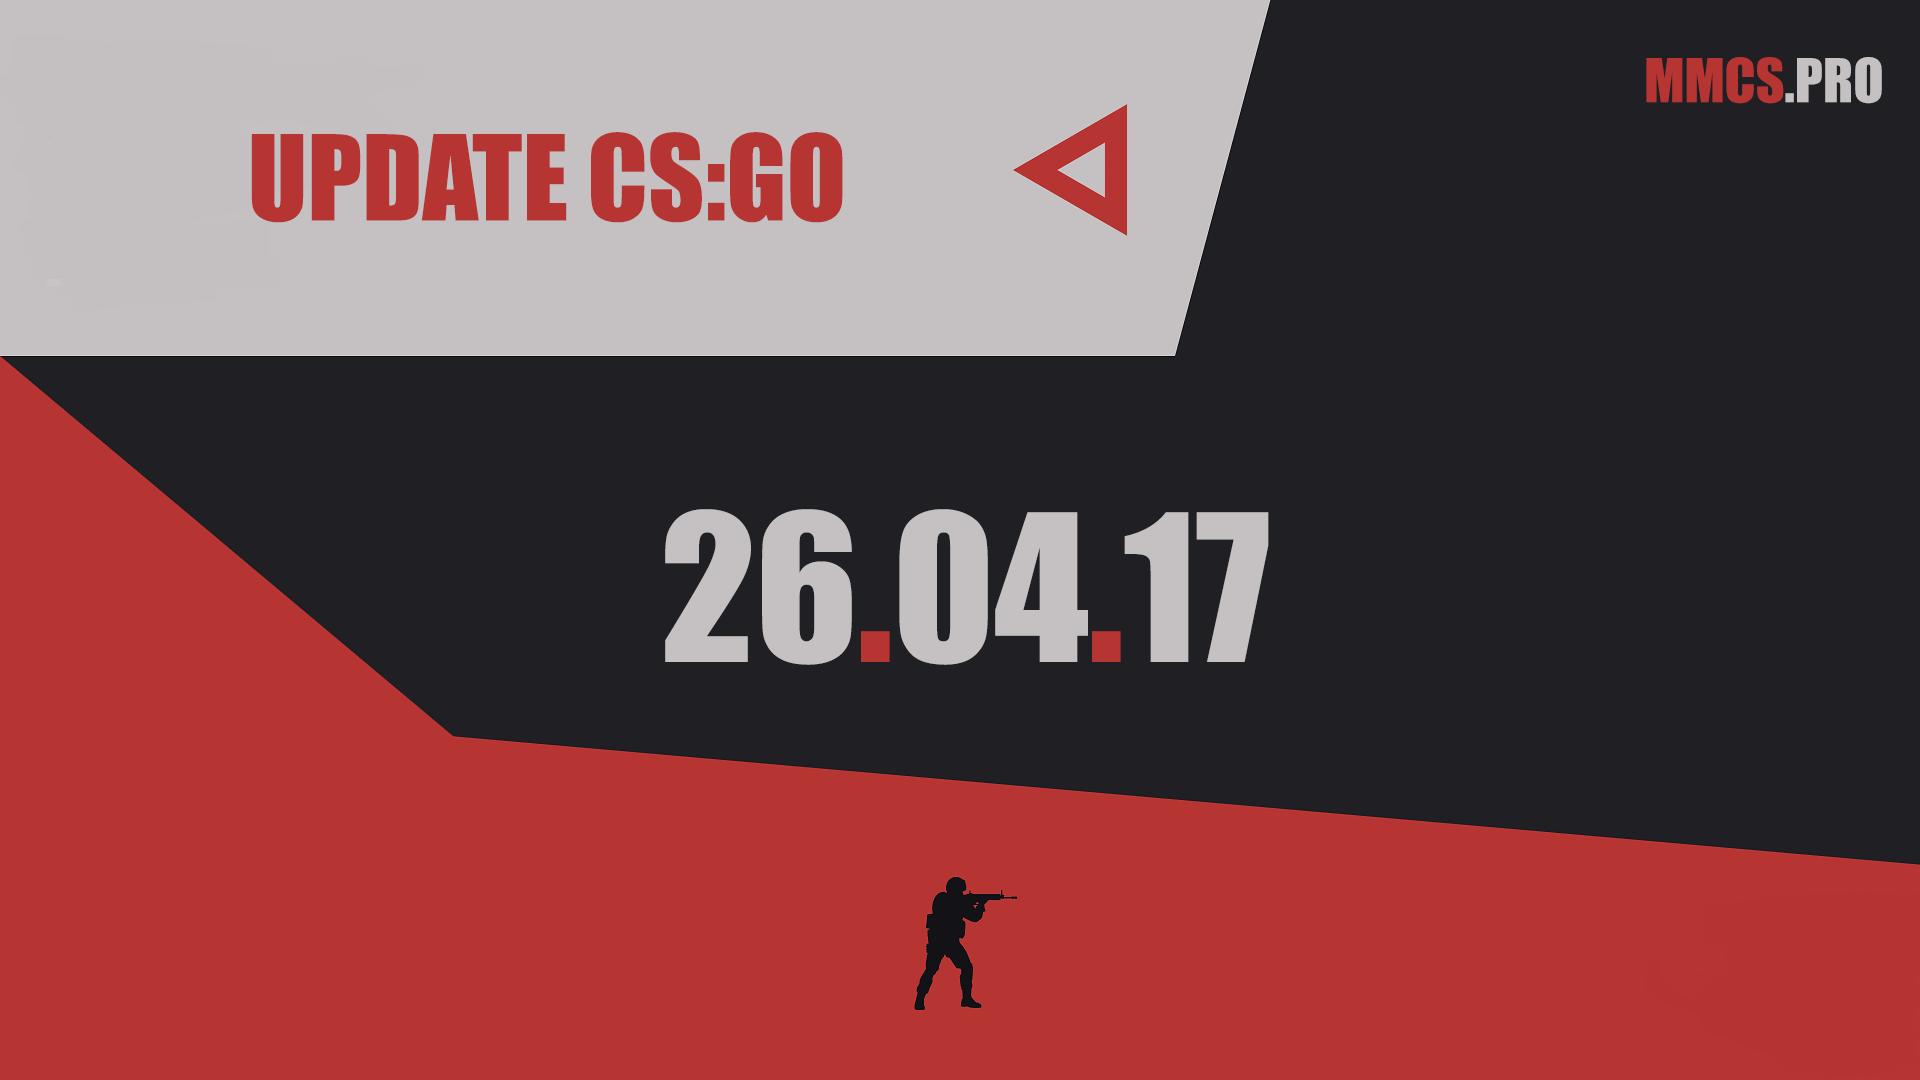 https://mmcs.pro/update-csgo-26-04-2017-valve/